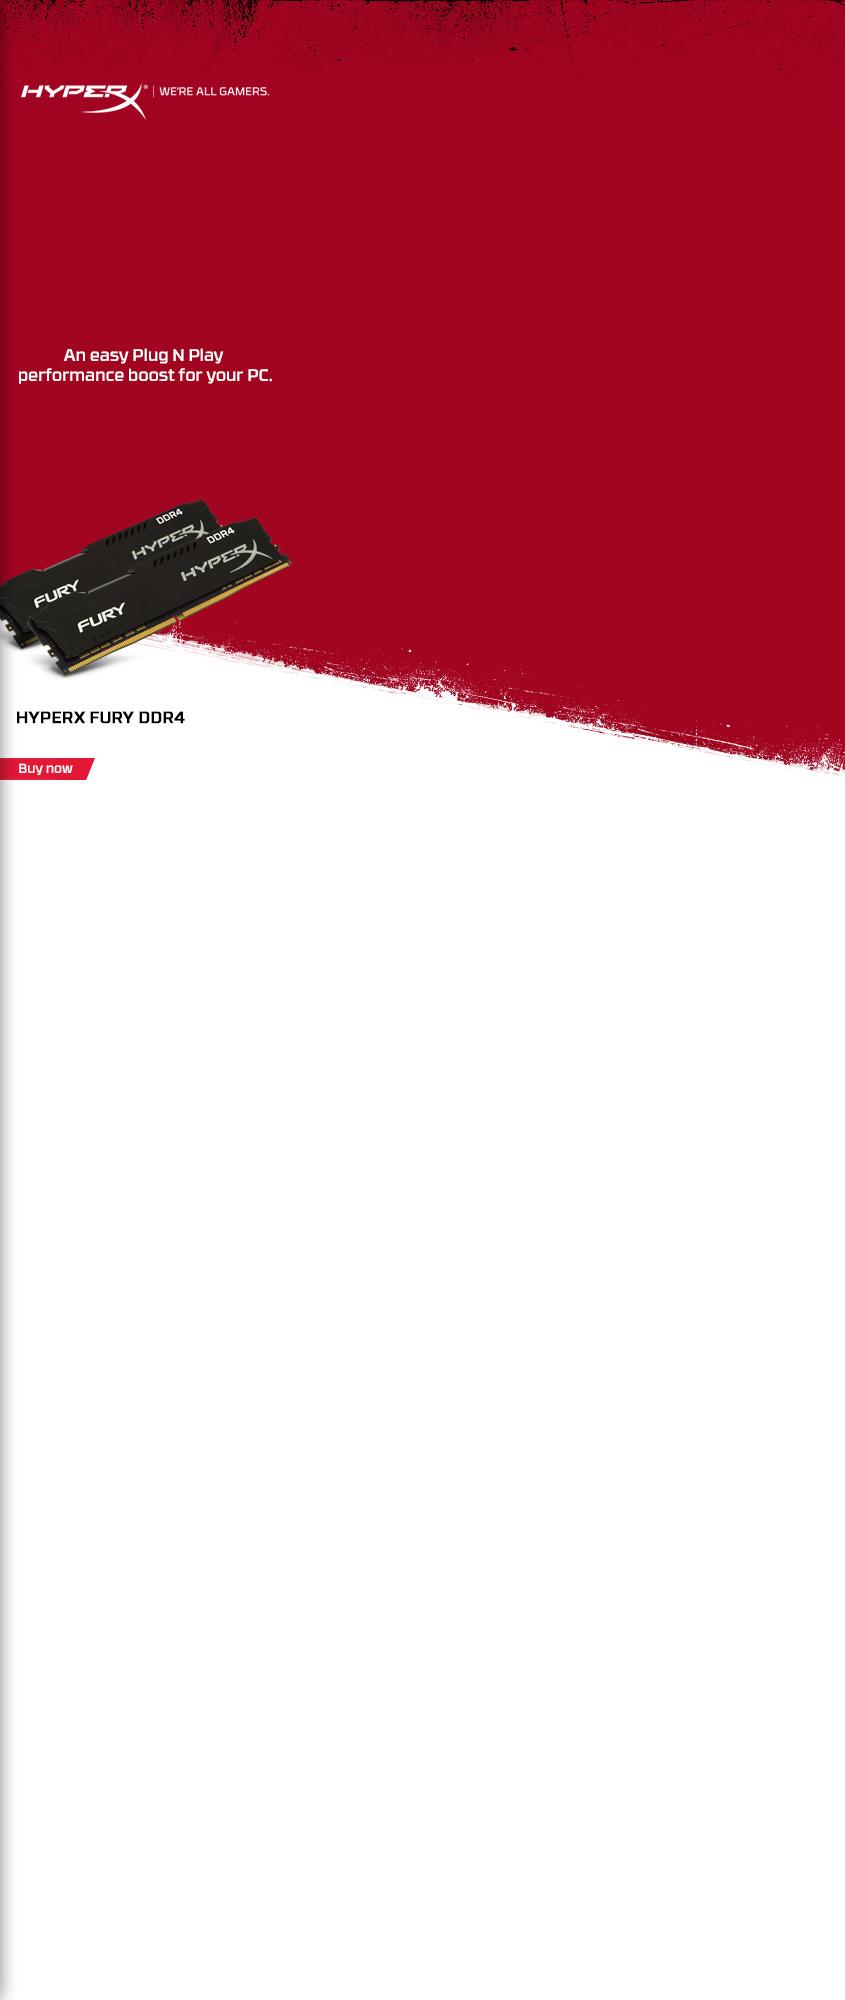 Corsair Vengeance RGB PRO 16GB (2x 8GB) 3200MHz - CMW16GX4M2C3200C16